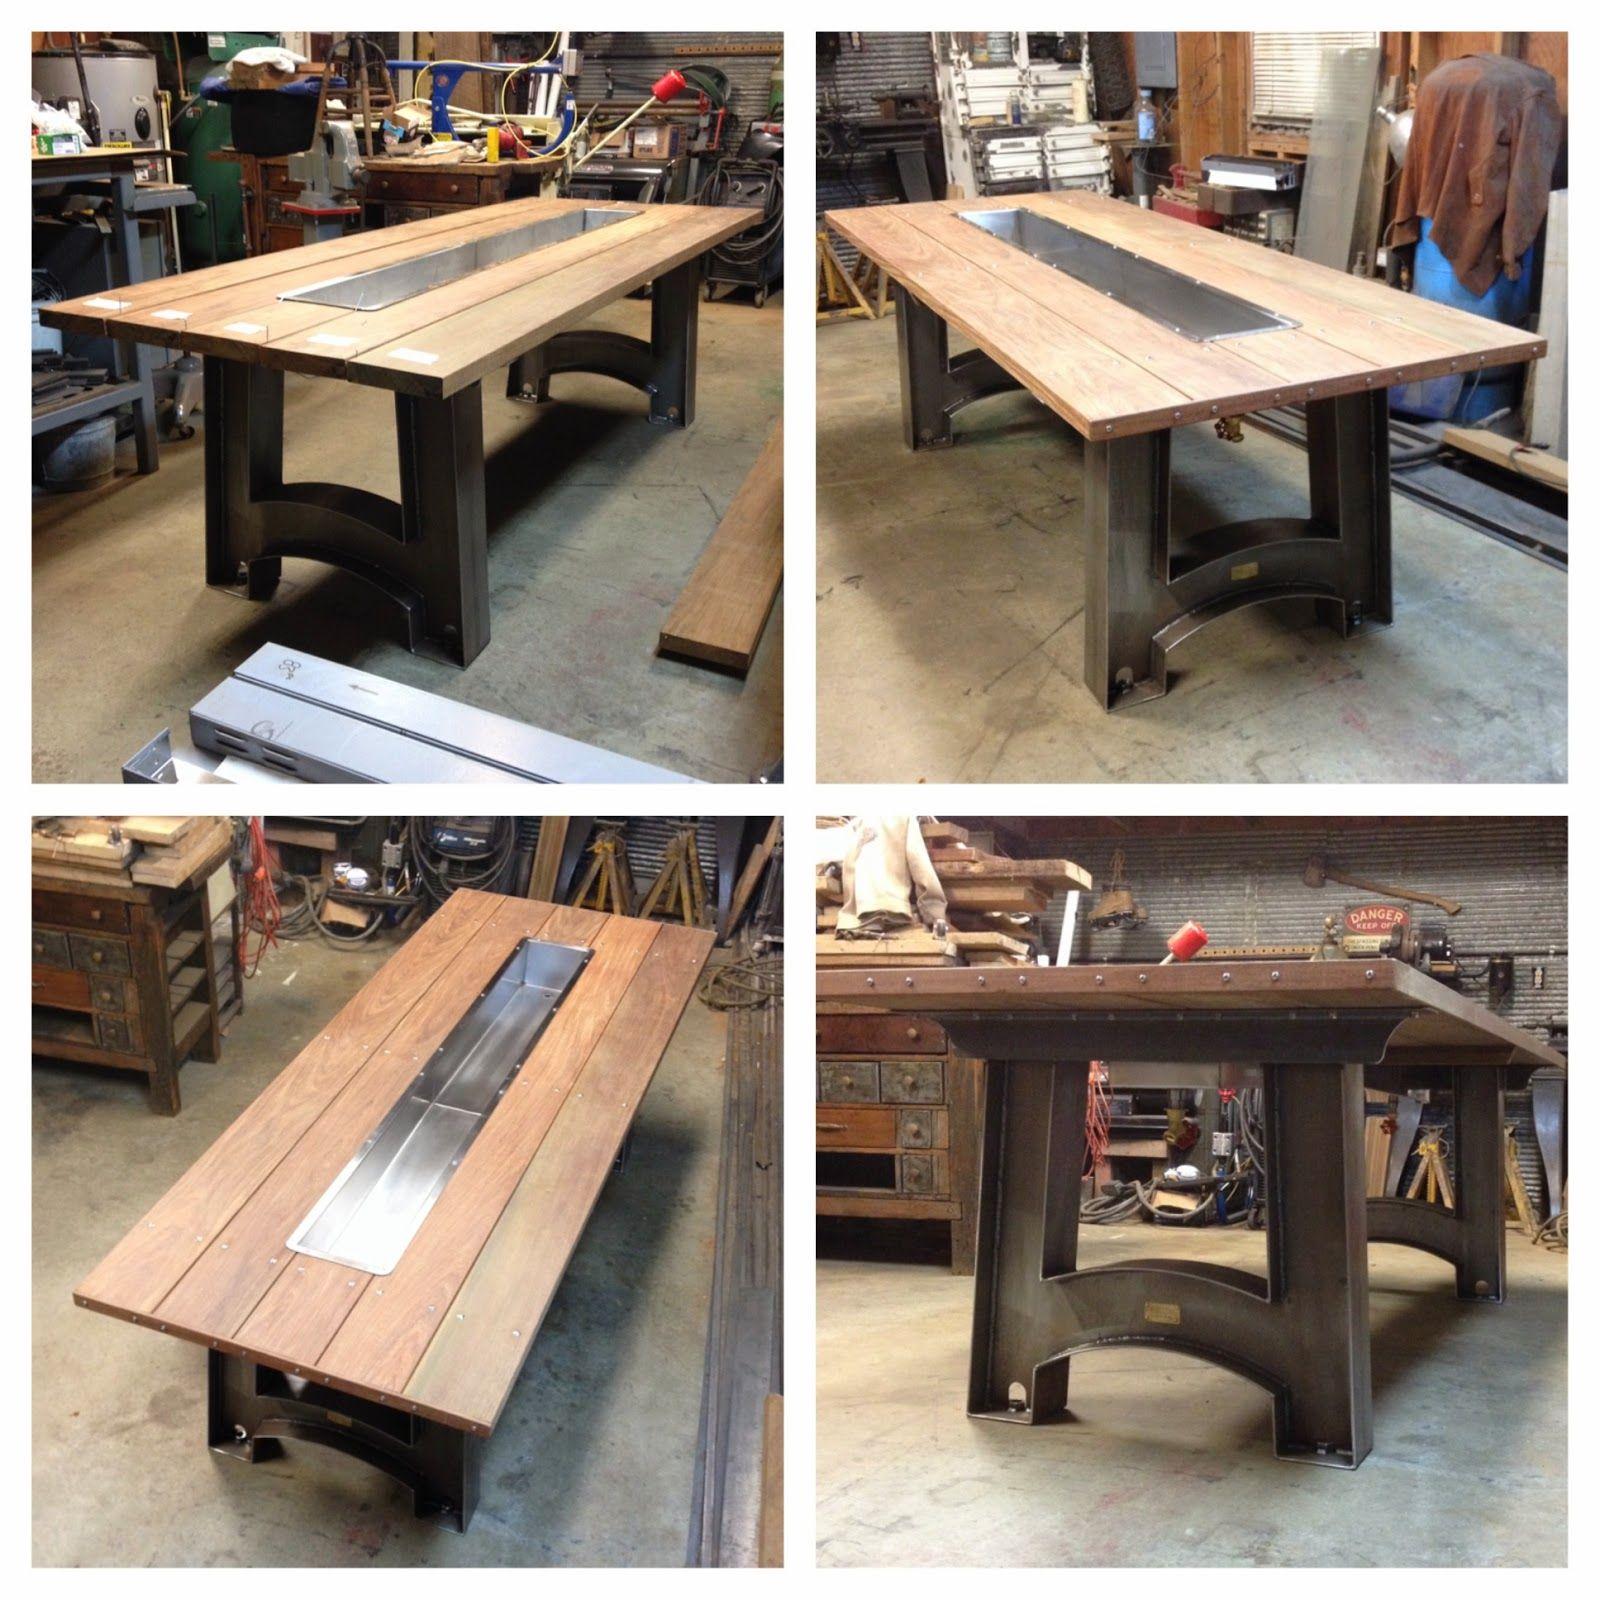 Black Falcon Fabrication Custom Built This Trough Table. Fabricated Steel  Legs, An Ipe Hardwood